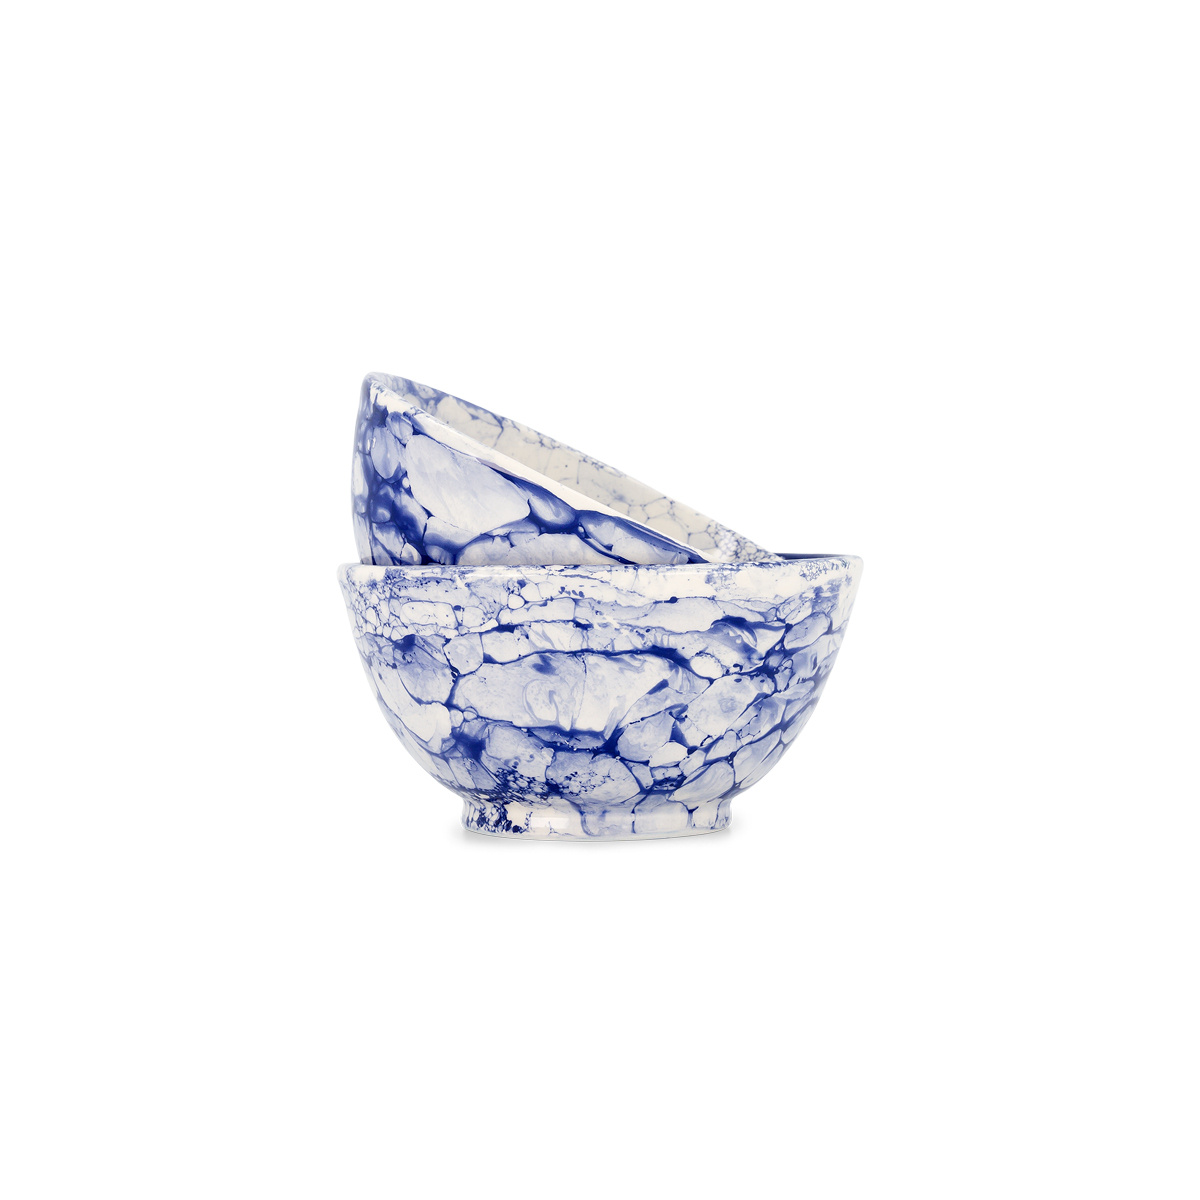 2 Blue Bolle Bowls